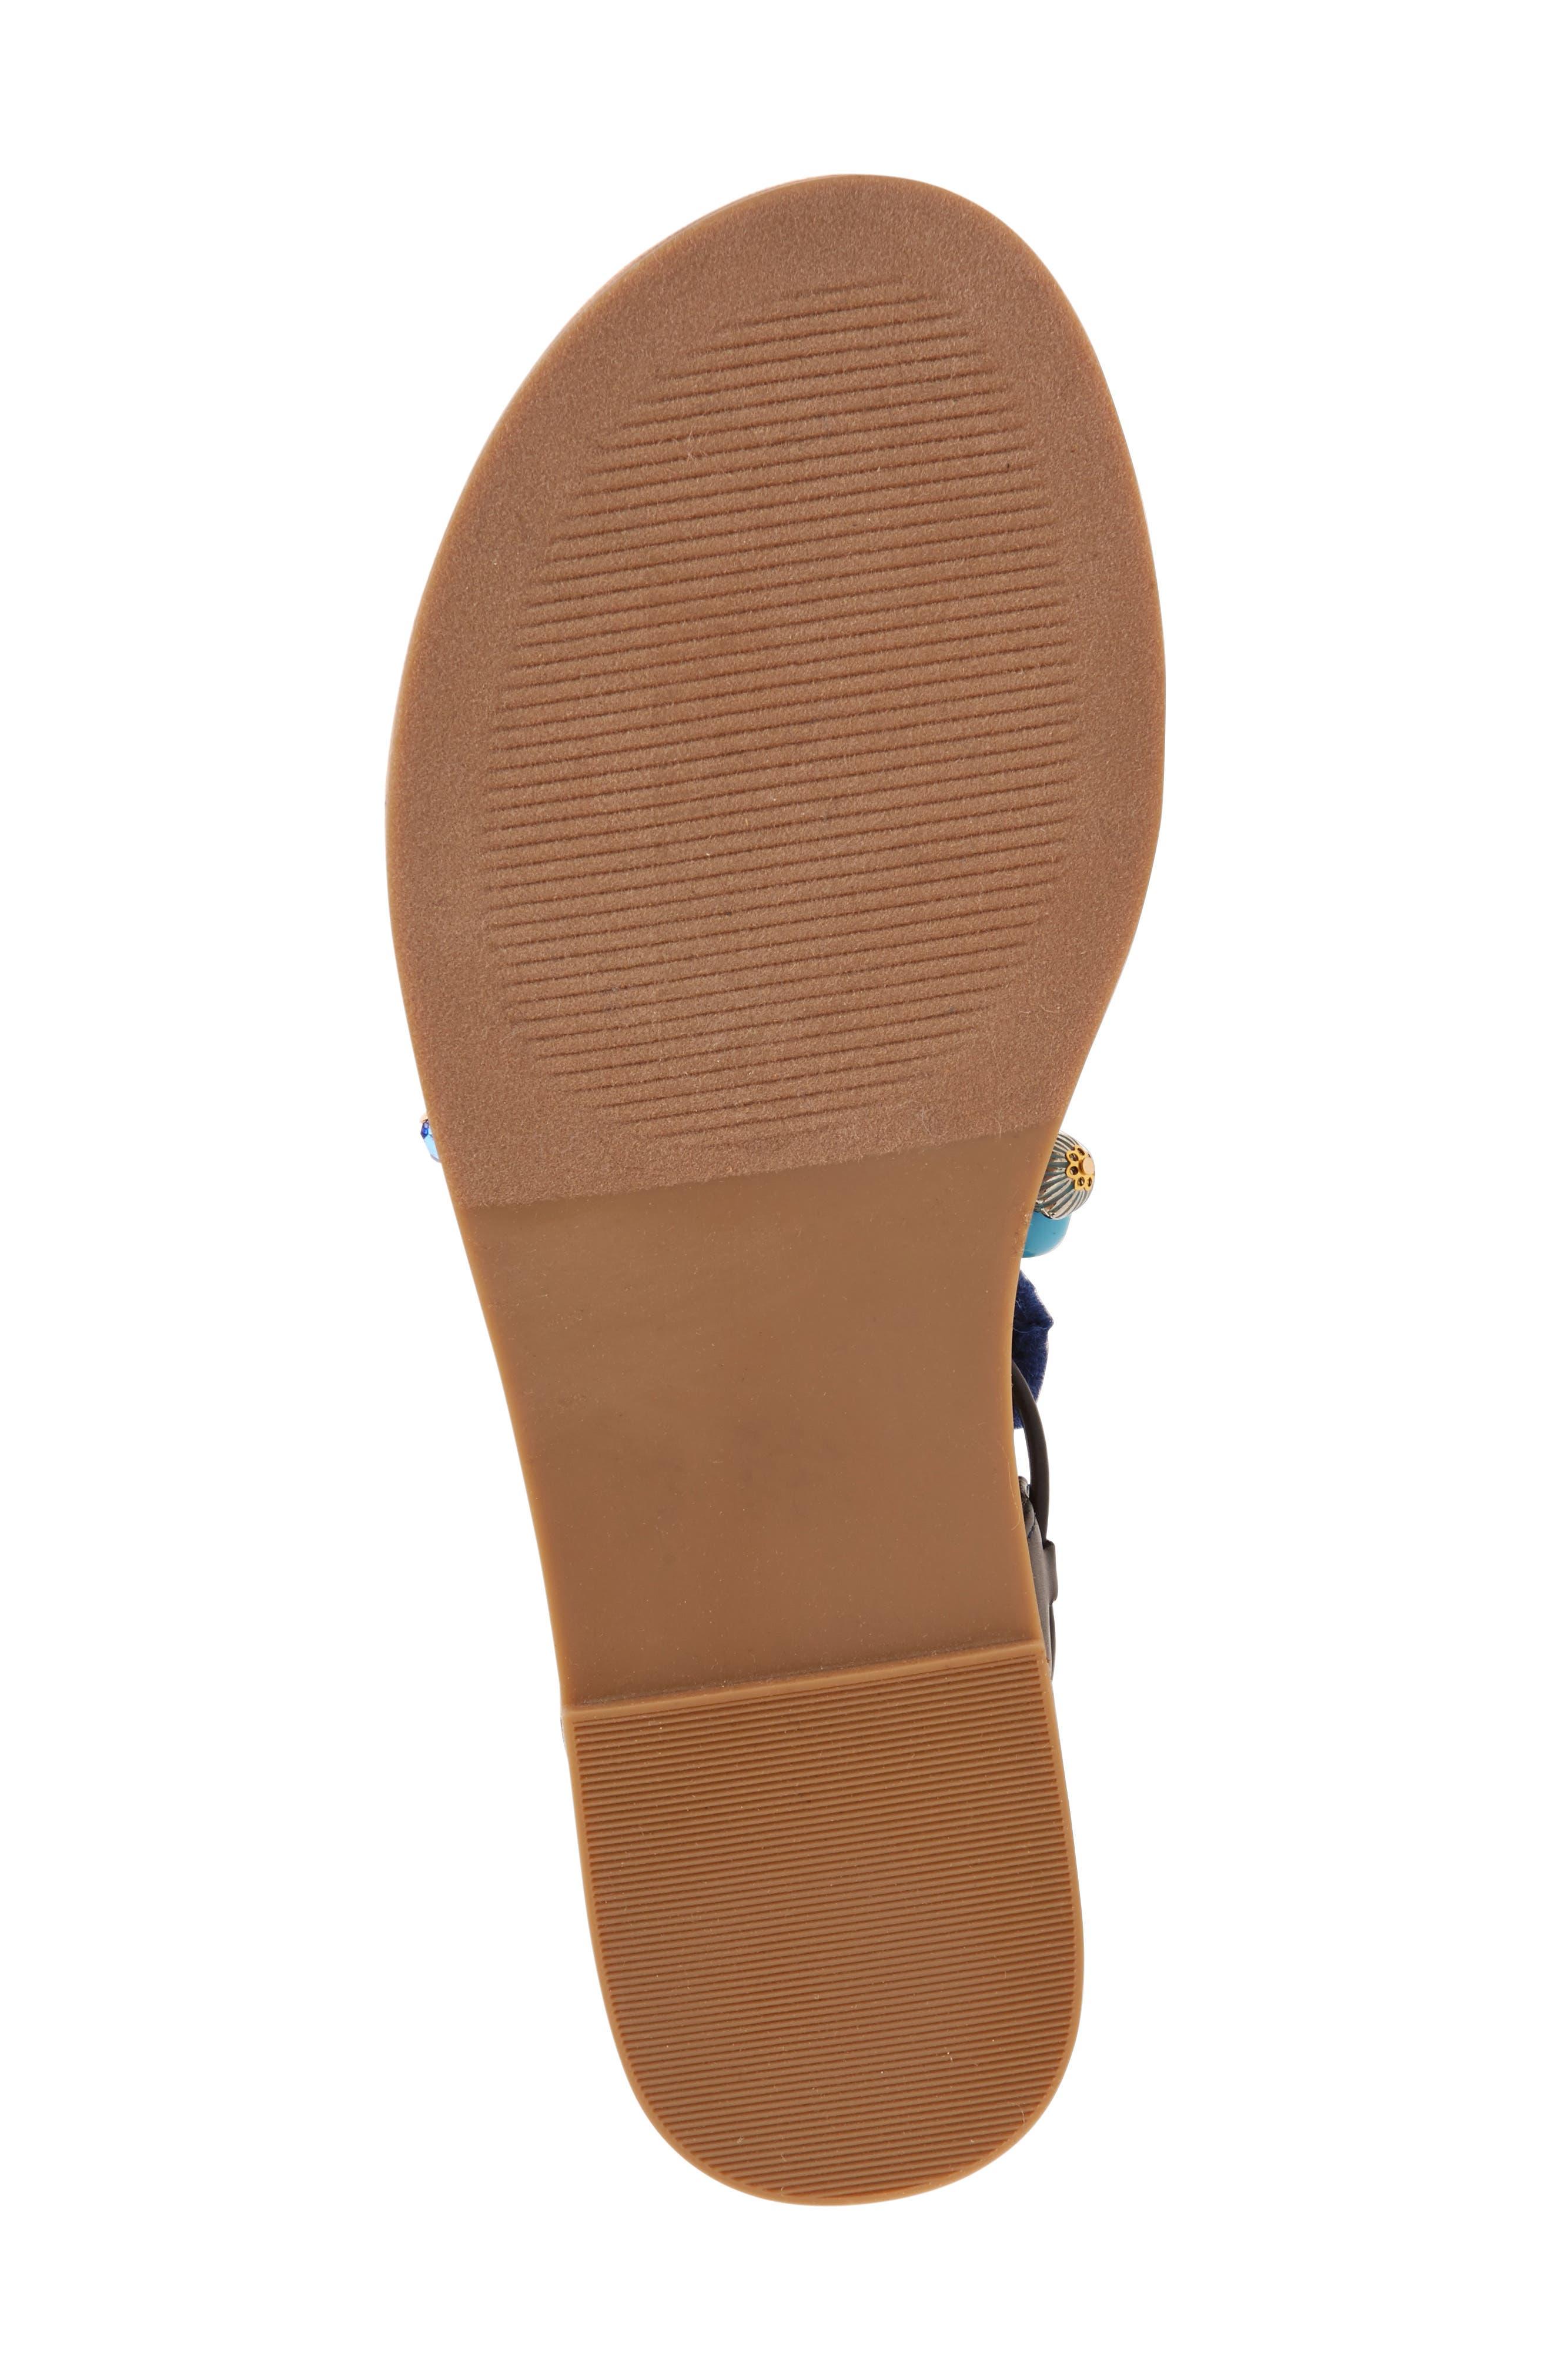 Laney Pompom Lace-Up Sandal,                             Alternate thumbnail 4, color,                             435